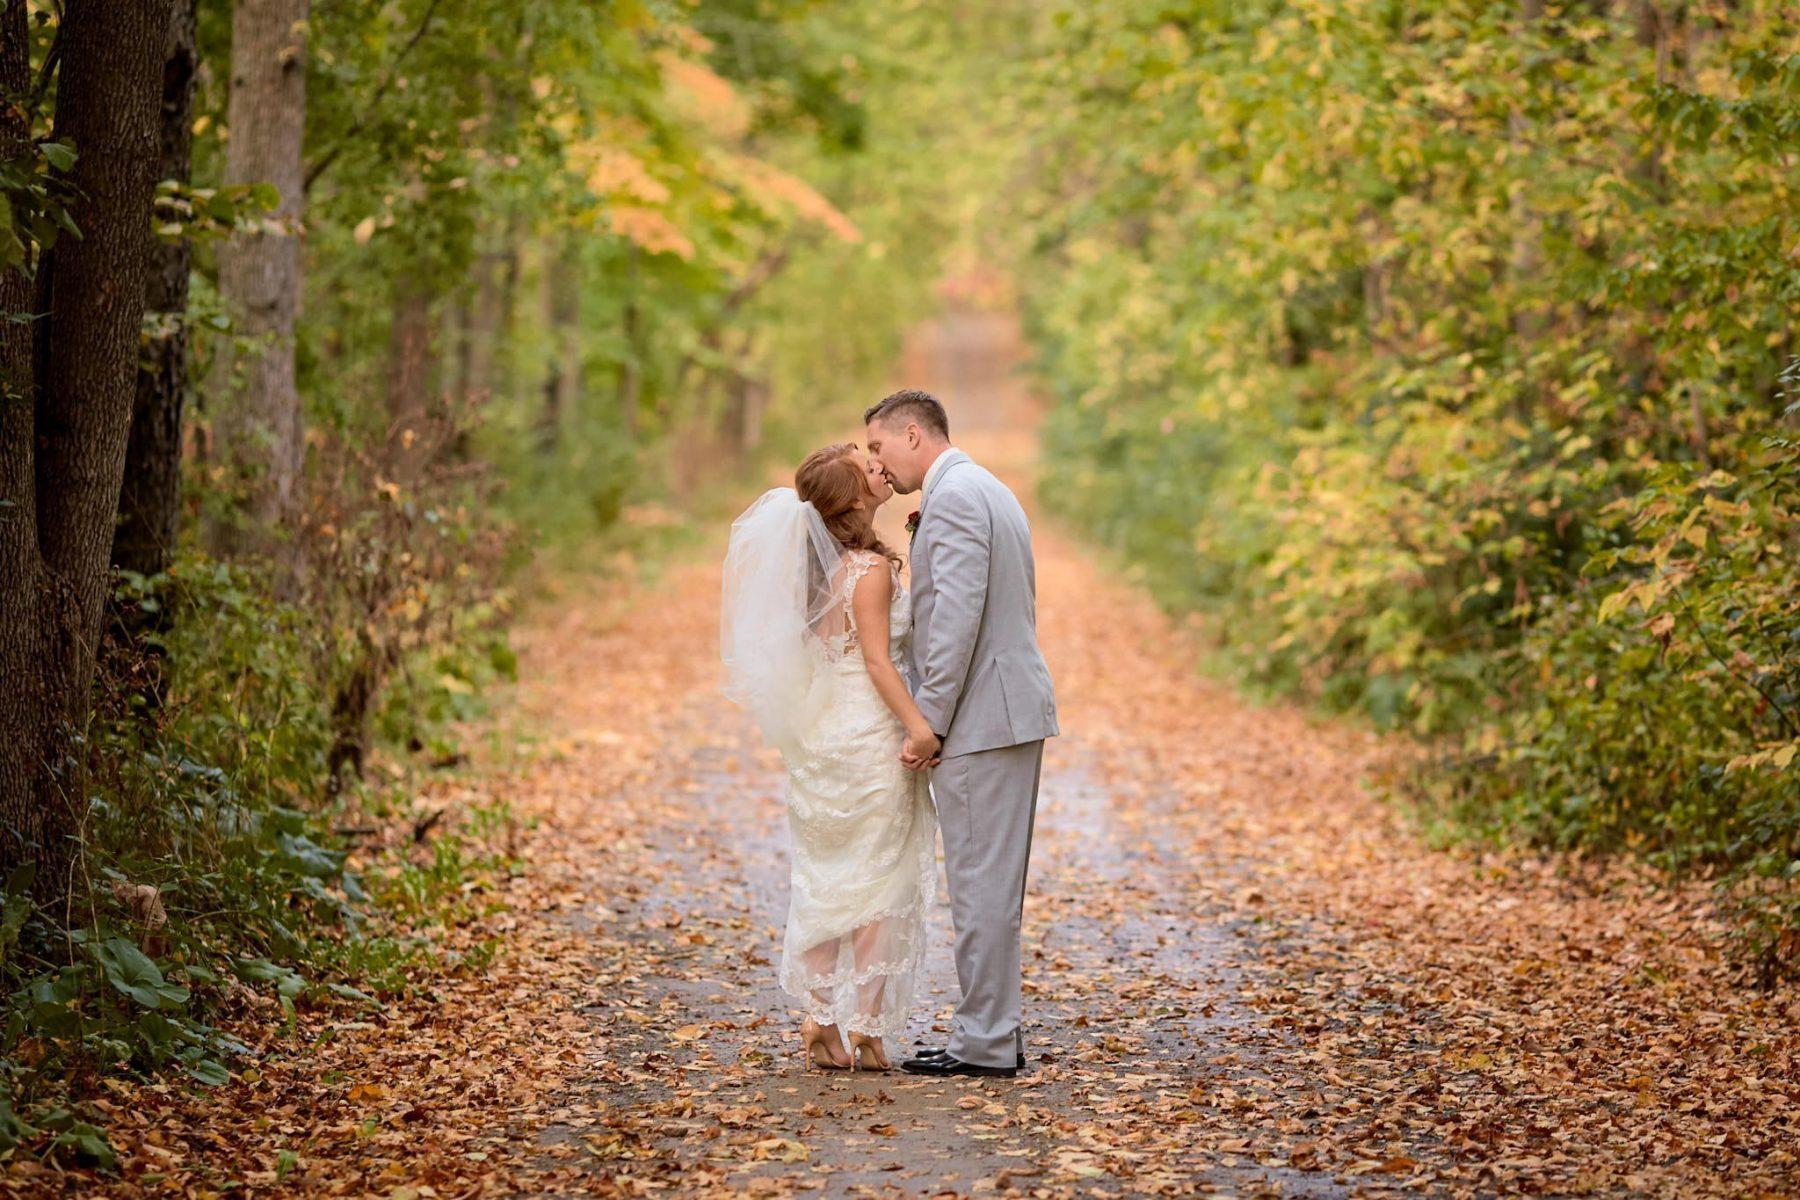 Wedding Photography beautiful moment